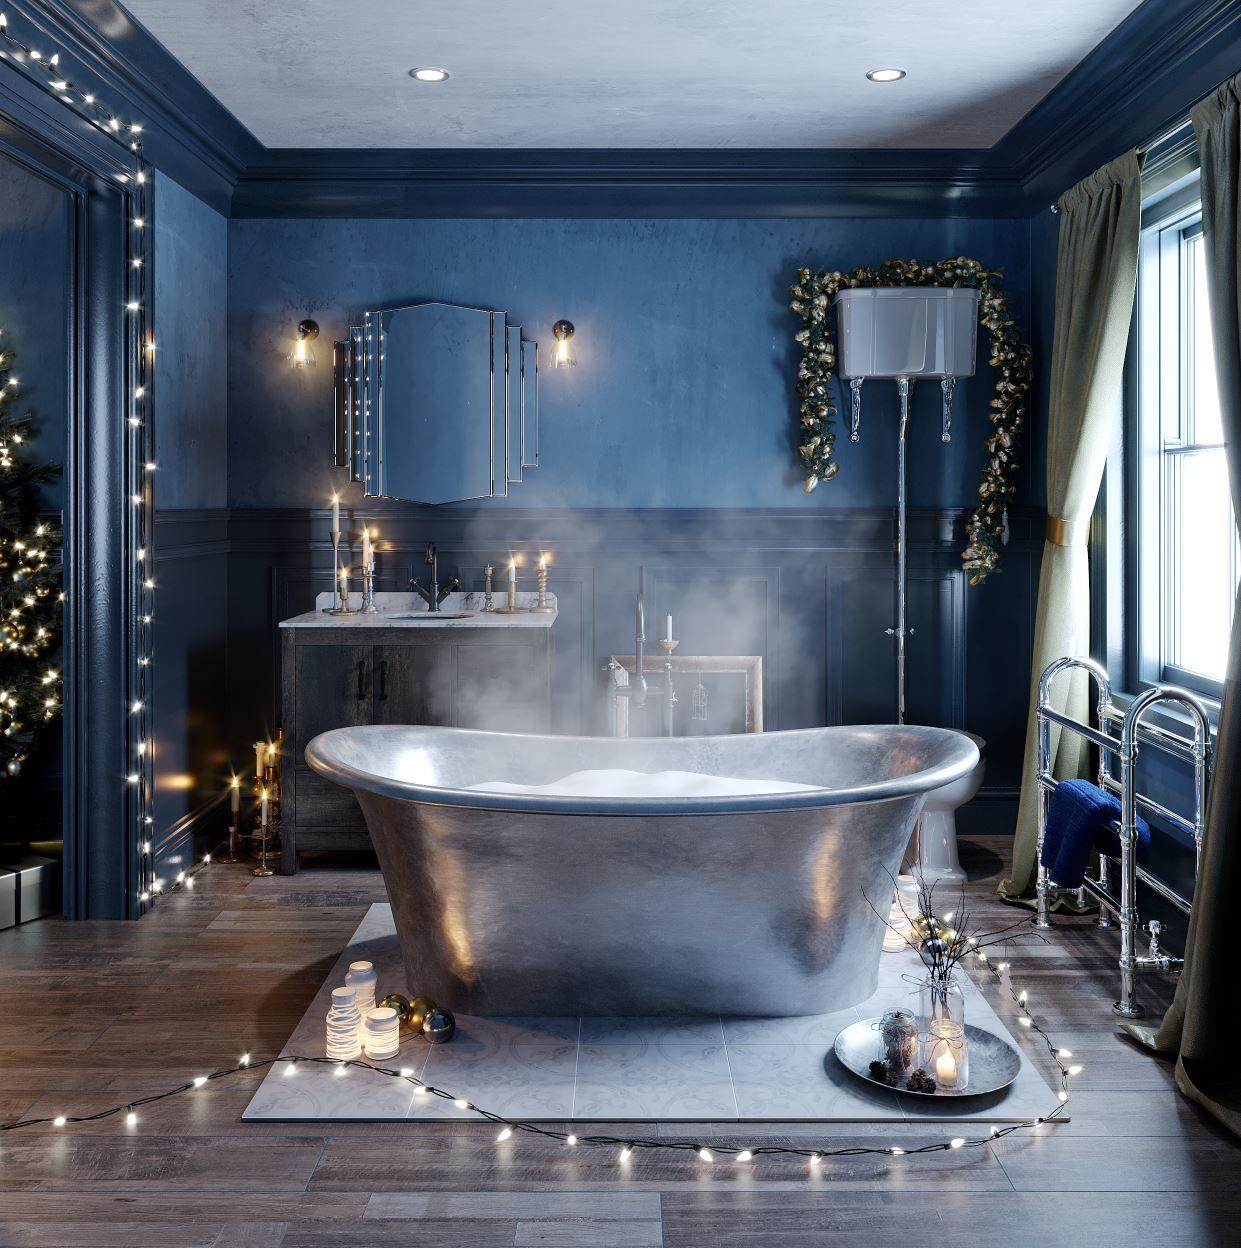 Bathroom Ideas Enchanted Winter part 2 Latest interior